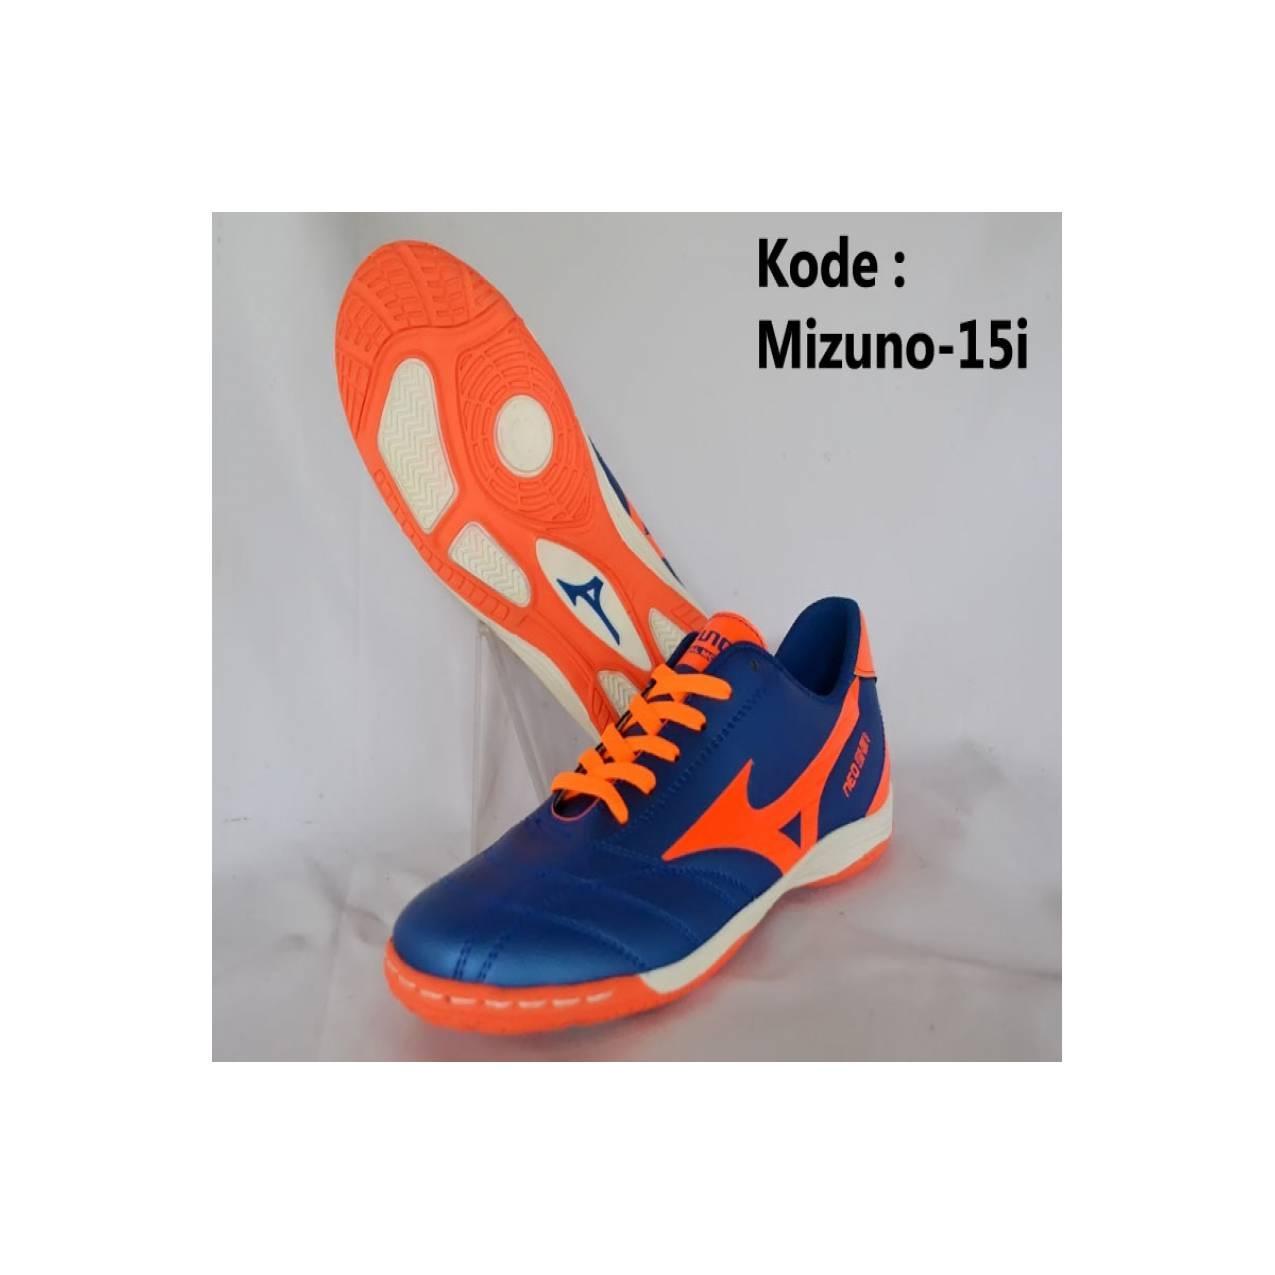 Sepatu Futsal Mizuno KW 1 Kode Mizuno 15i